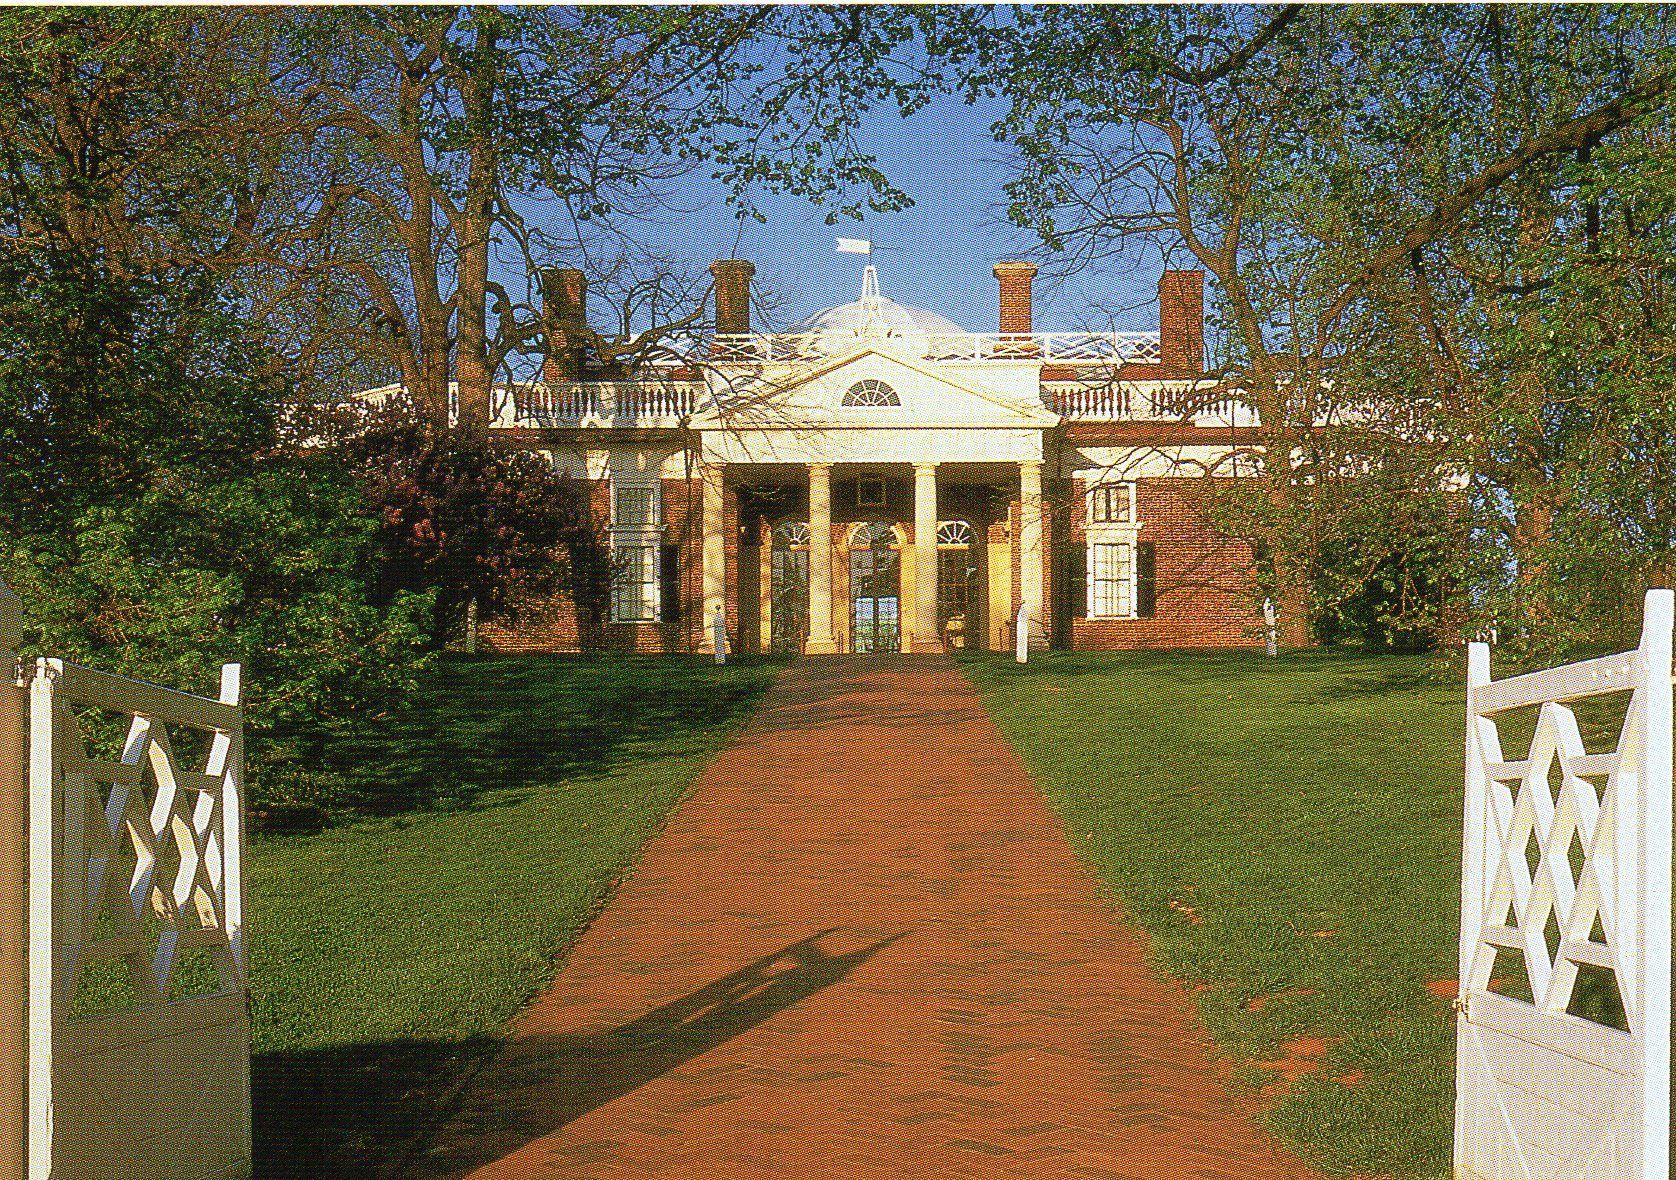 Front entrance of Monticello, Charlottesville, VA. Photo